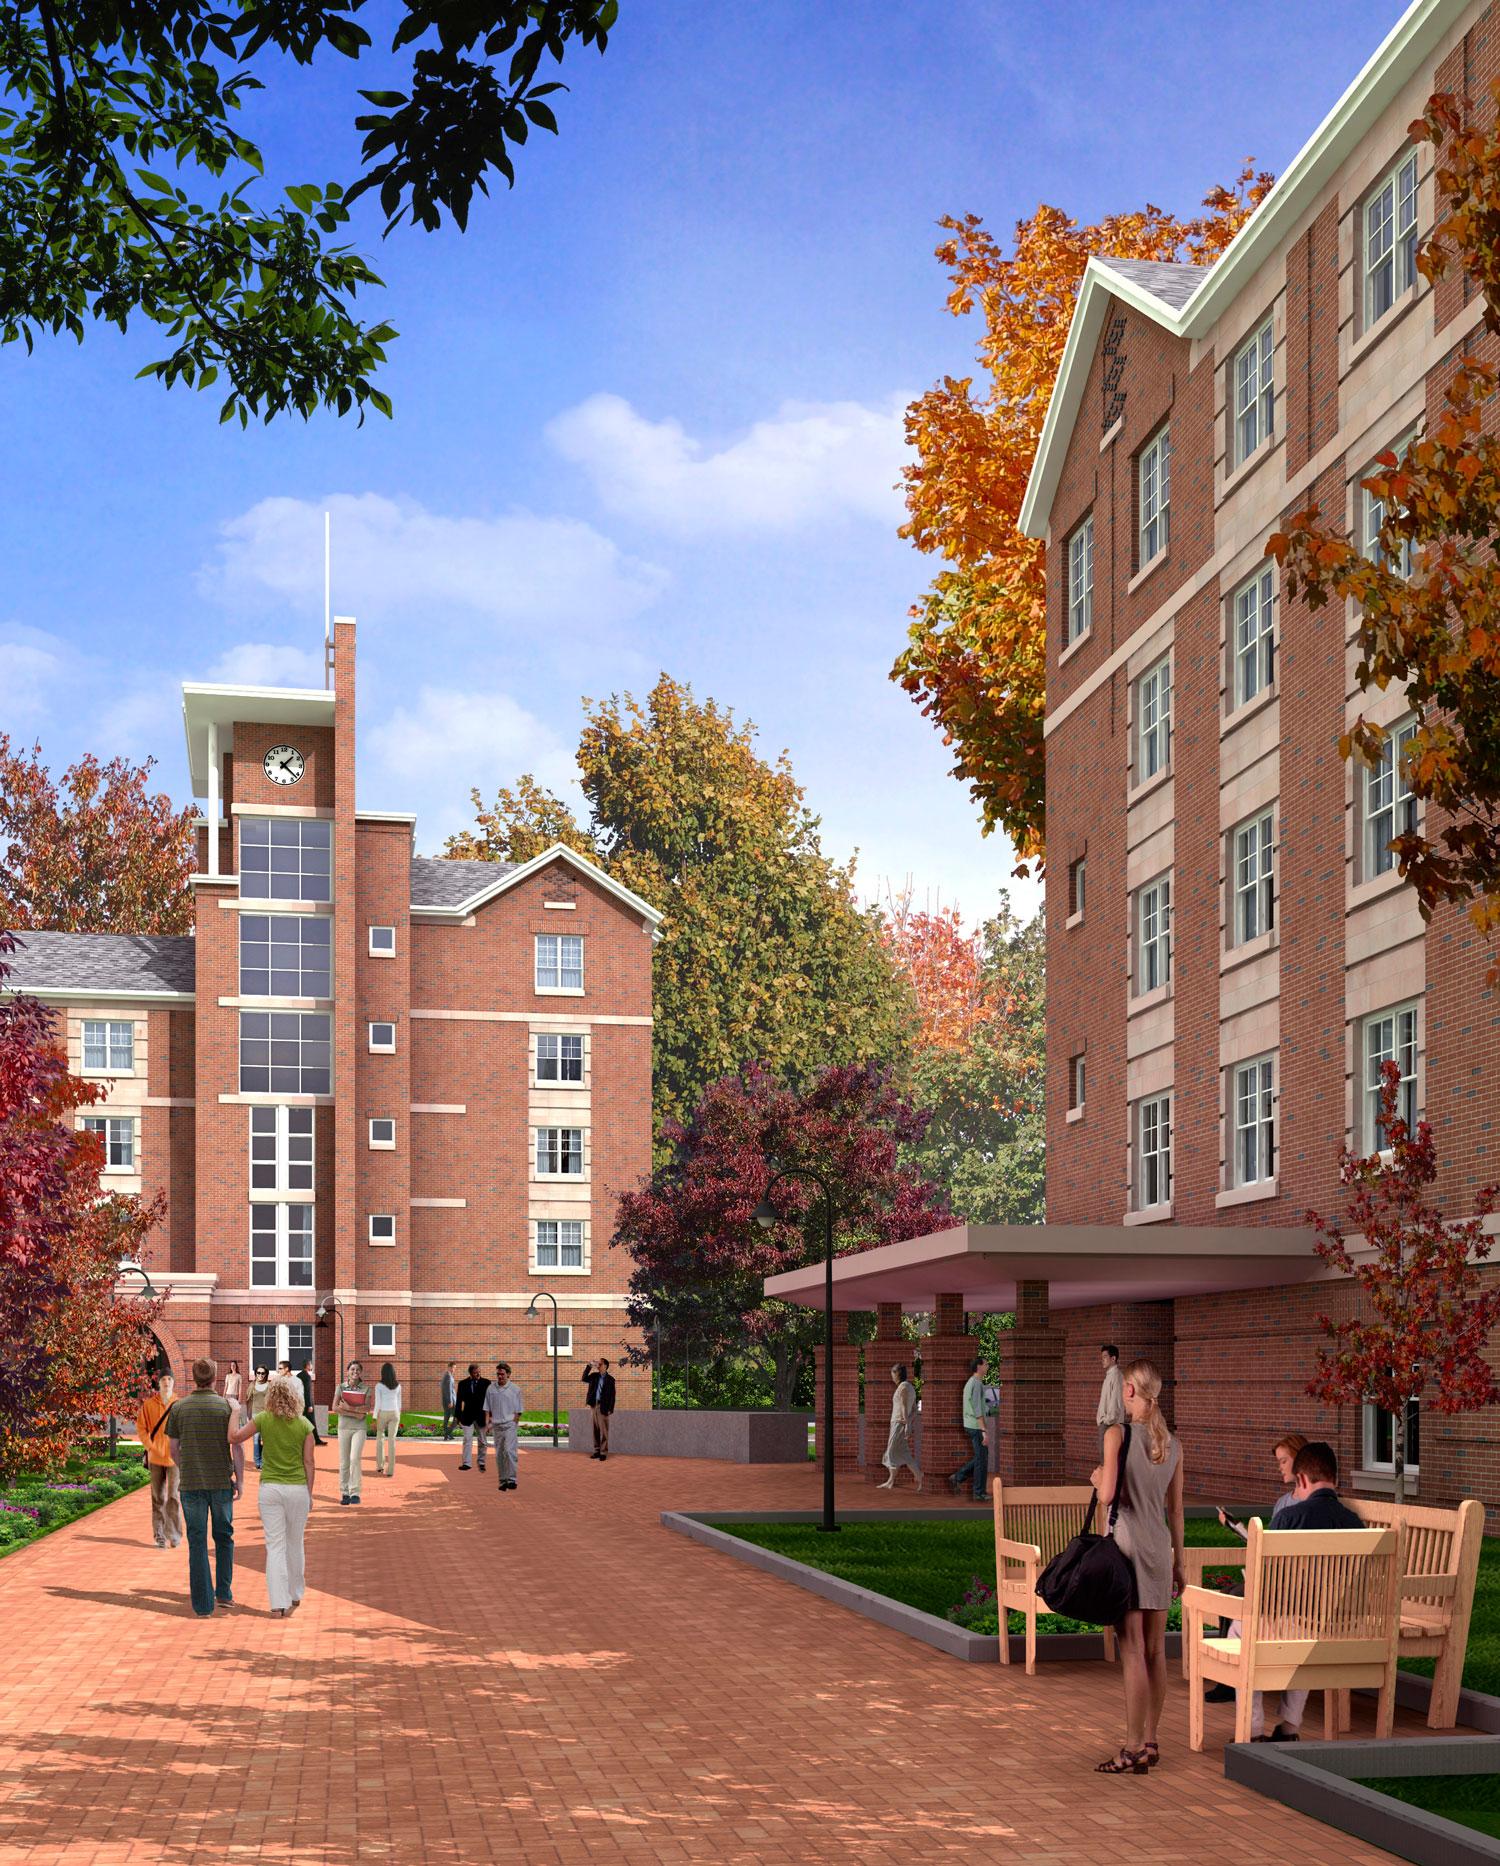 University Of New Hampshire Sets National Model For Rape